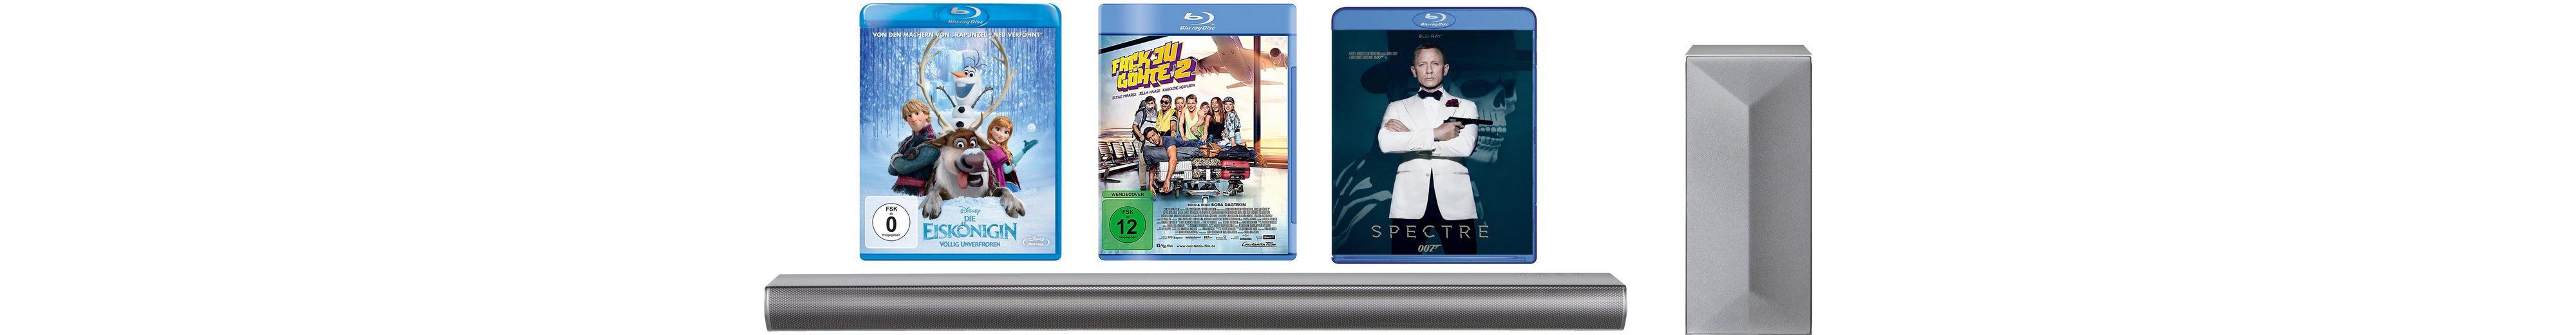 "LG LAC650H Soundbar inkl. Blu-ray Filme ""James Bond Spectre, Die Eiskönigin, Fack Ju Göthe 2"""